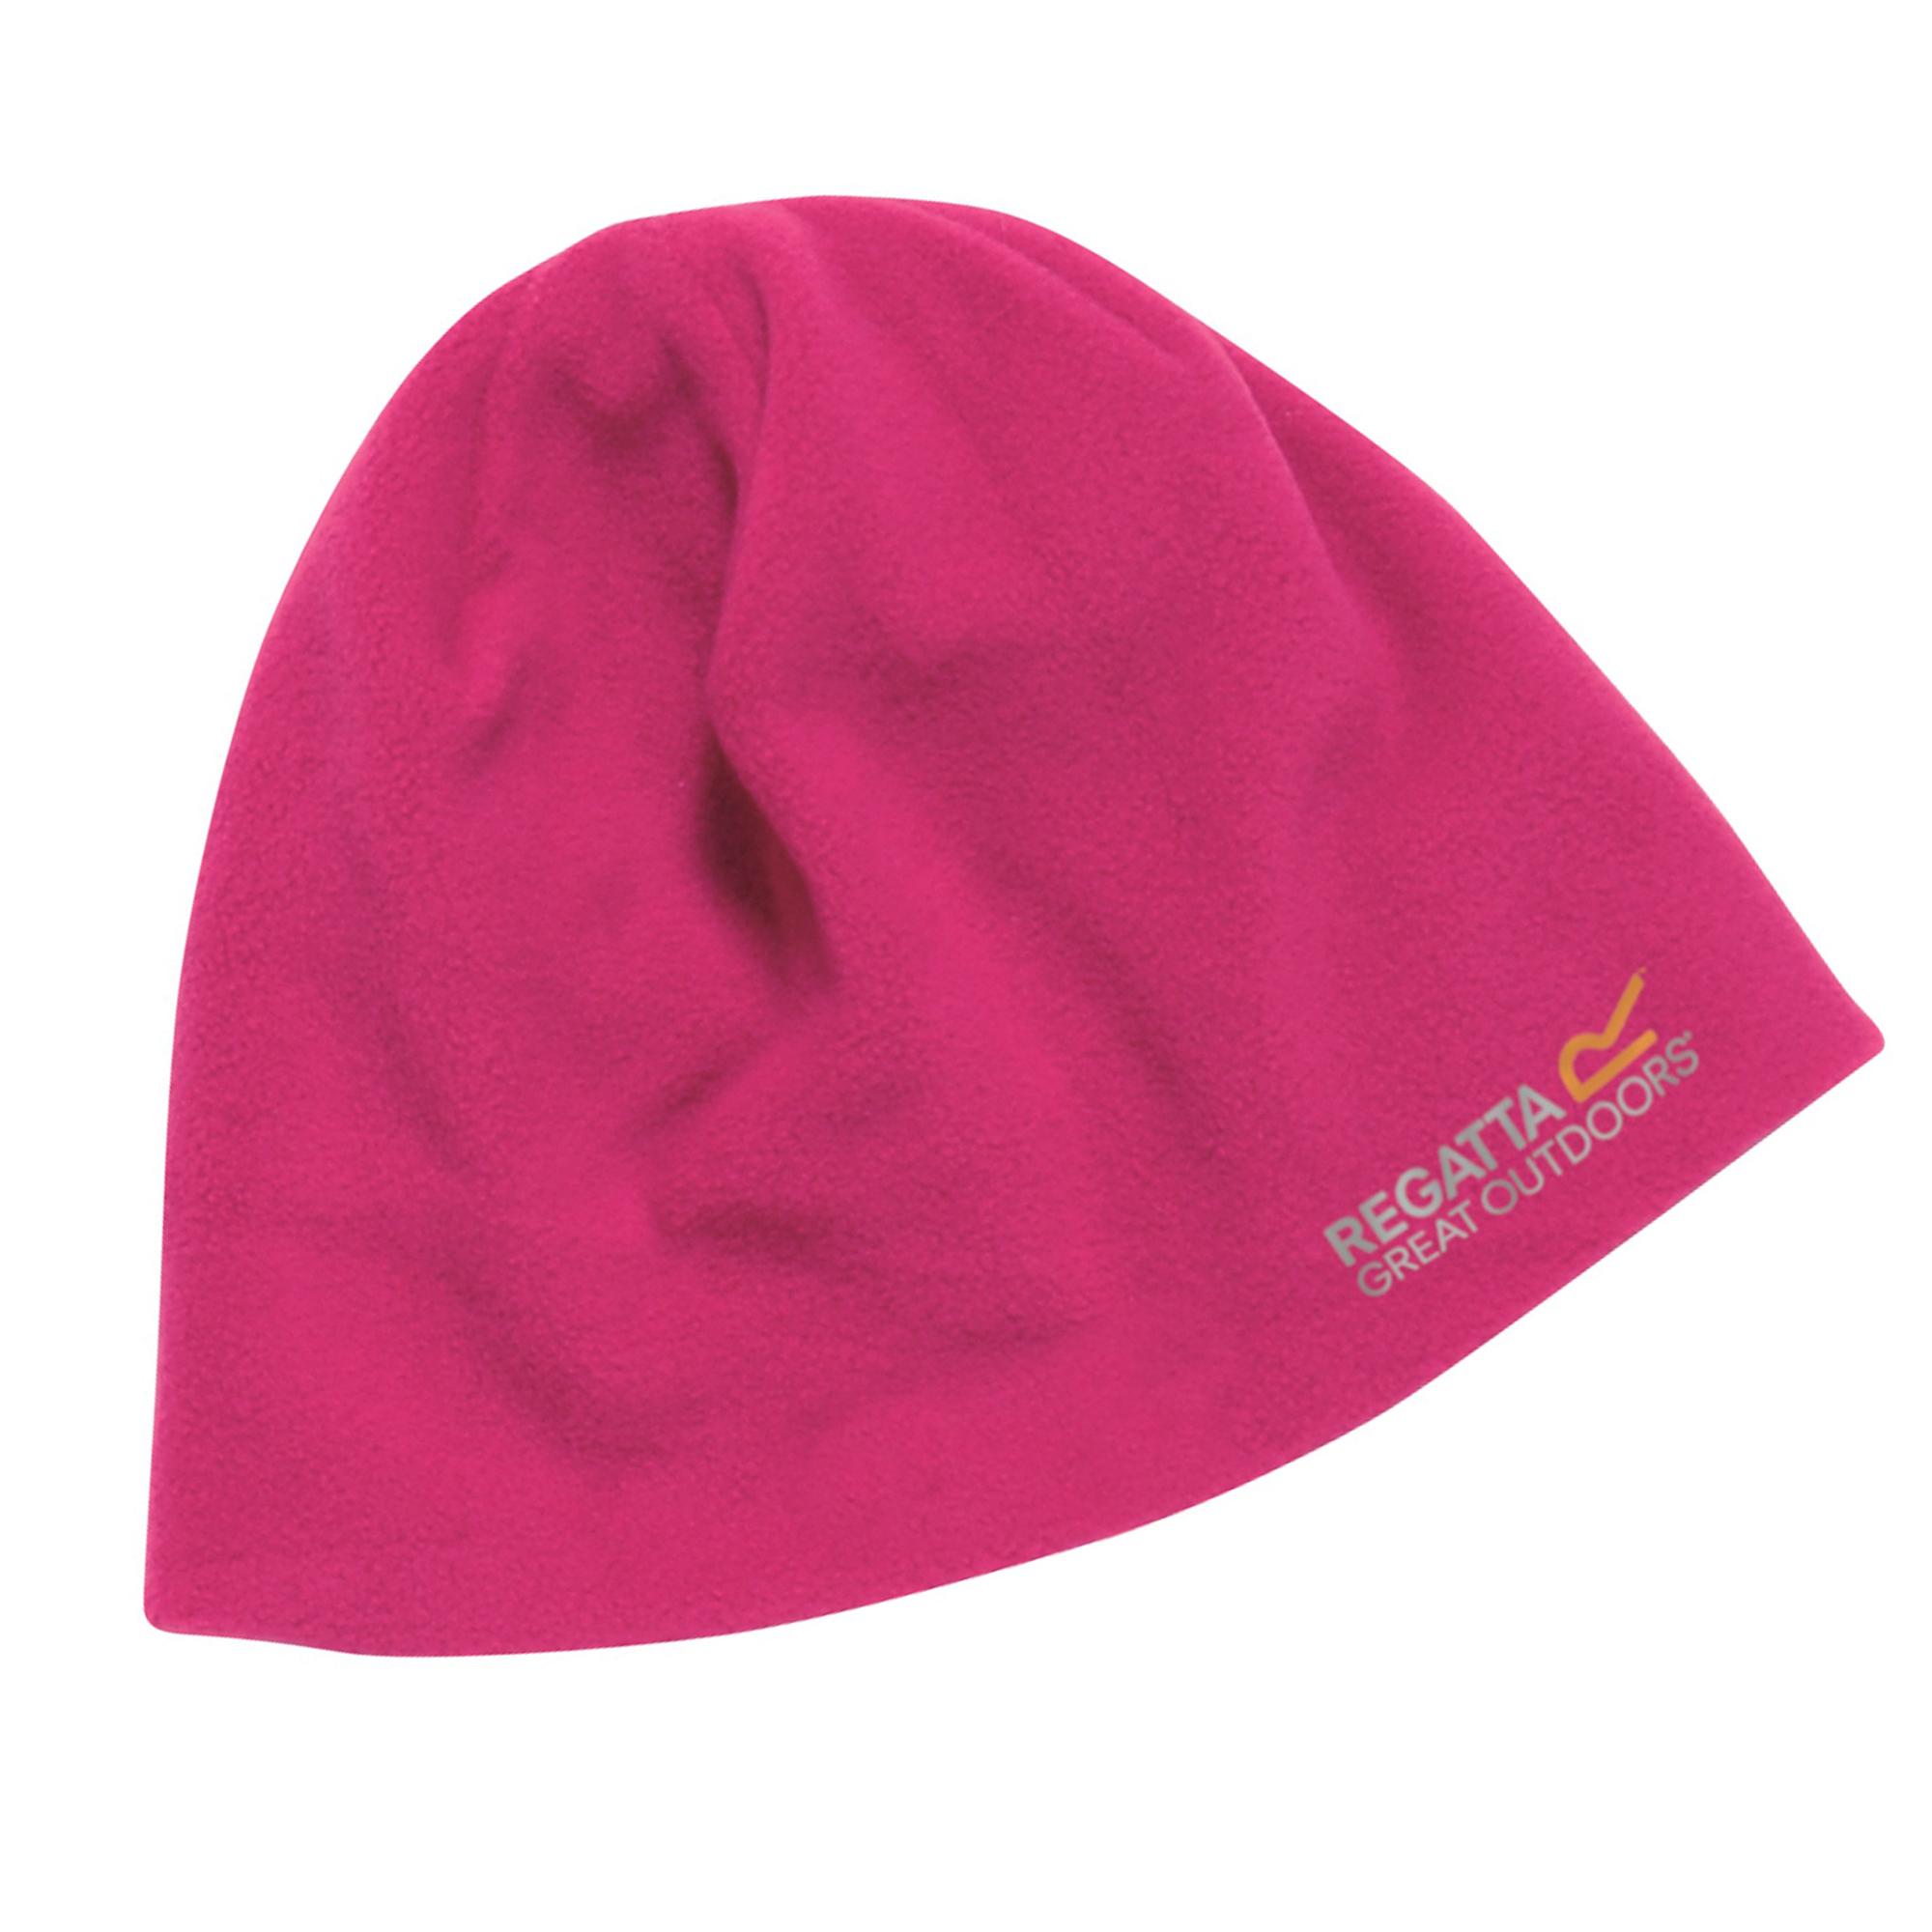 Regatta-Great-Outdoors-Childrens-Kids-Taz-II-Winter-Fleece-Hat-RG581